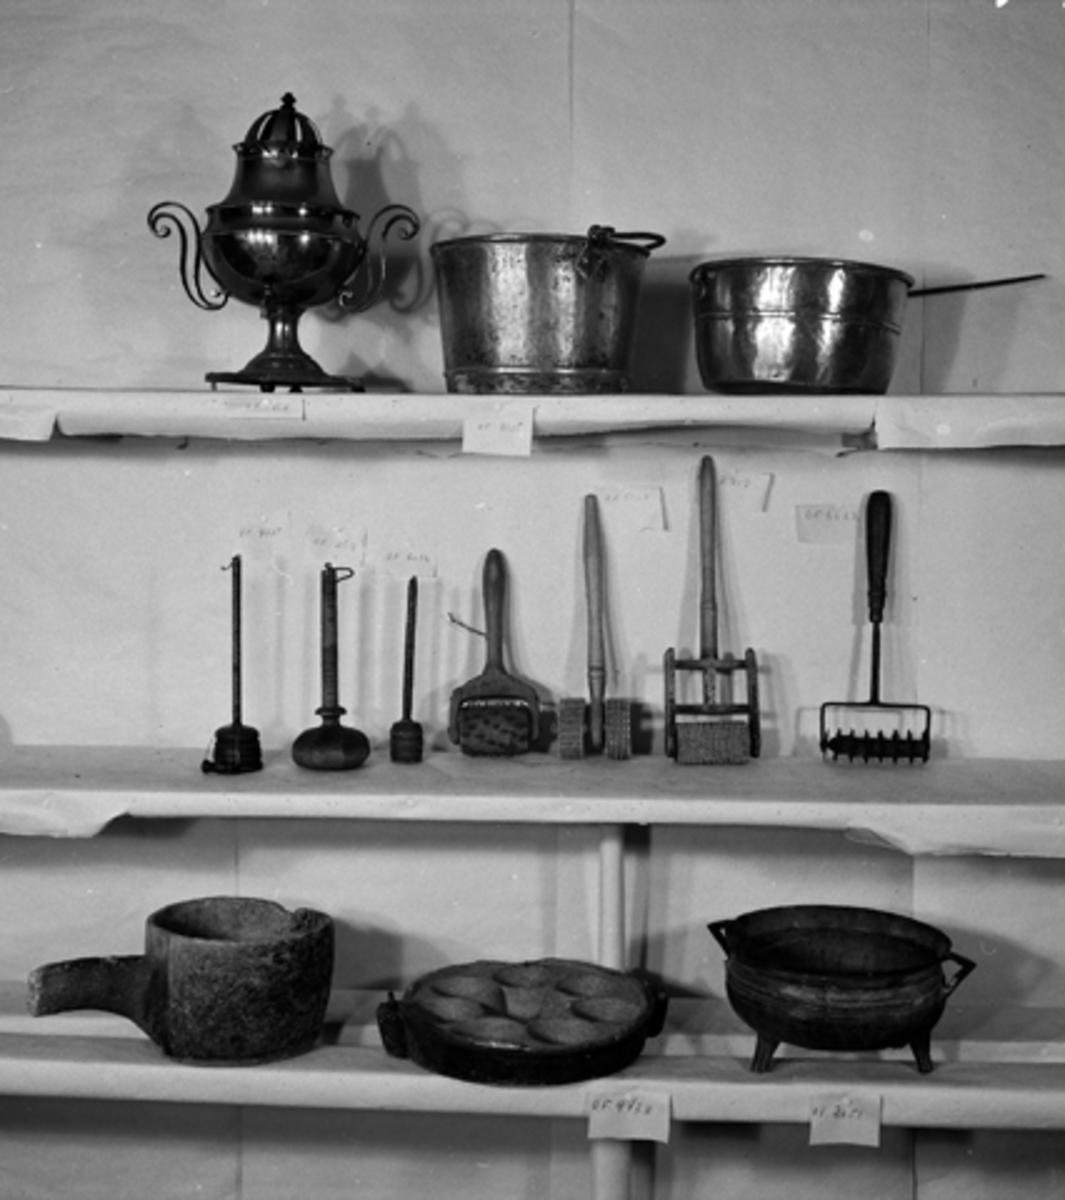 Gjenstandfotografering, Opplandenes folkemuseums samling. (Hedmarksmuseet)OF. 6032. BISMERVEKT. RINGSAKER. OF. 2509. BISMER. OF. 4775. BISMER. FURNES. OF. 2919. FLATBRØDRULLE. VANG.